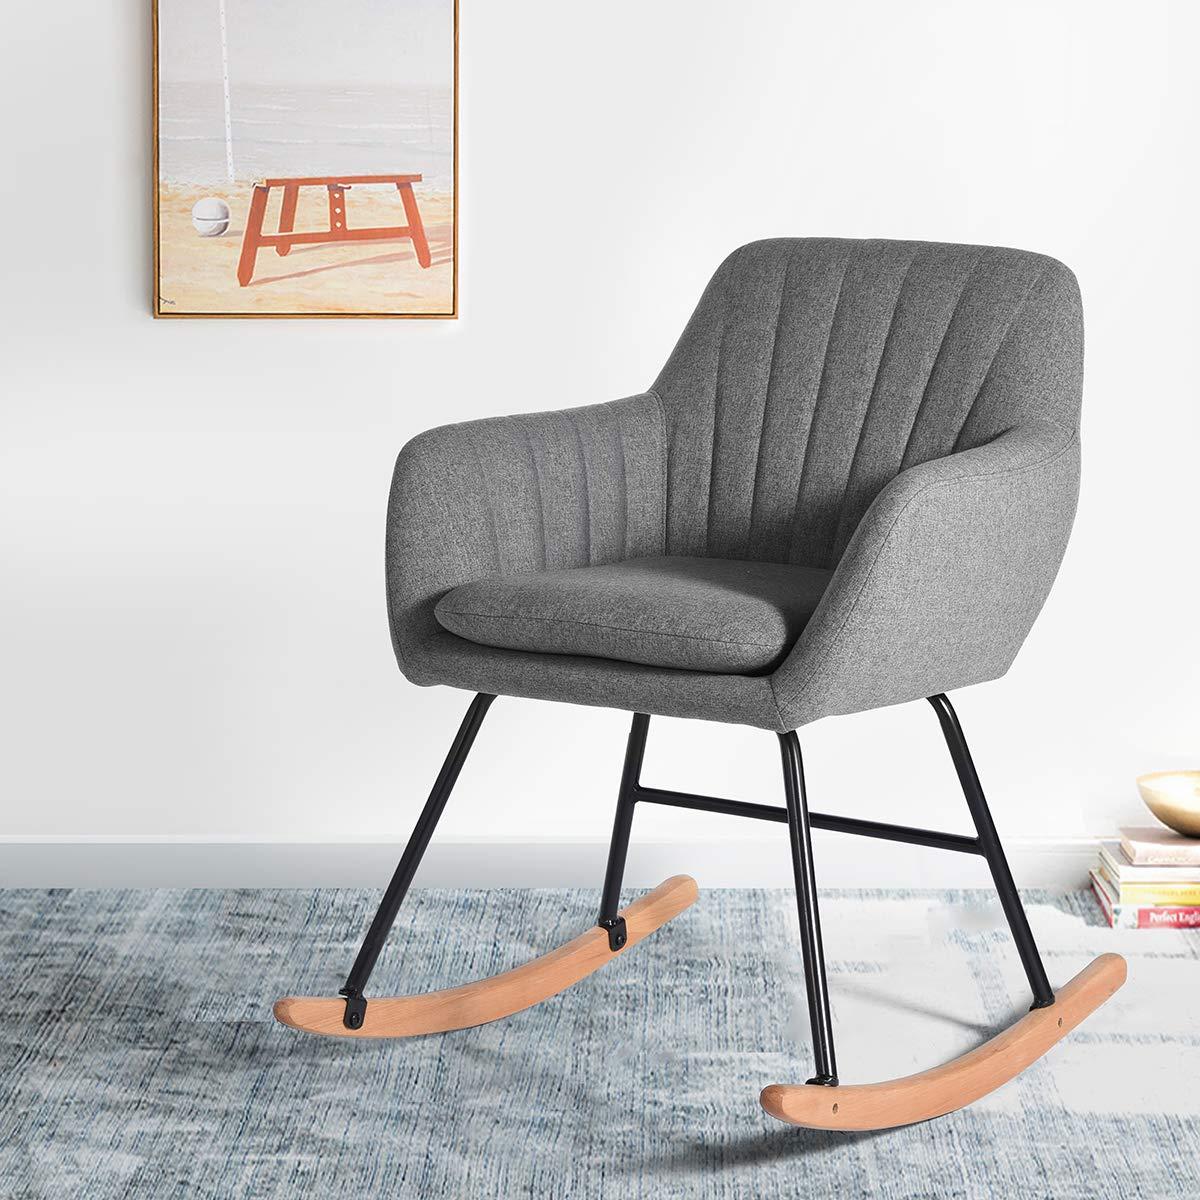 Grey Fabric Metal Rocking Chair Living Room Armchair FurnitureR